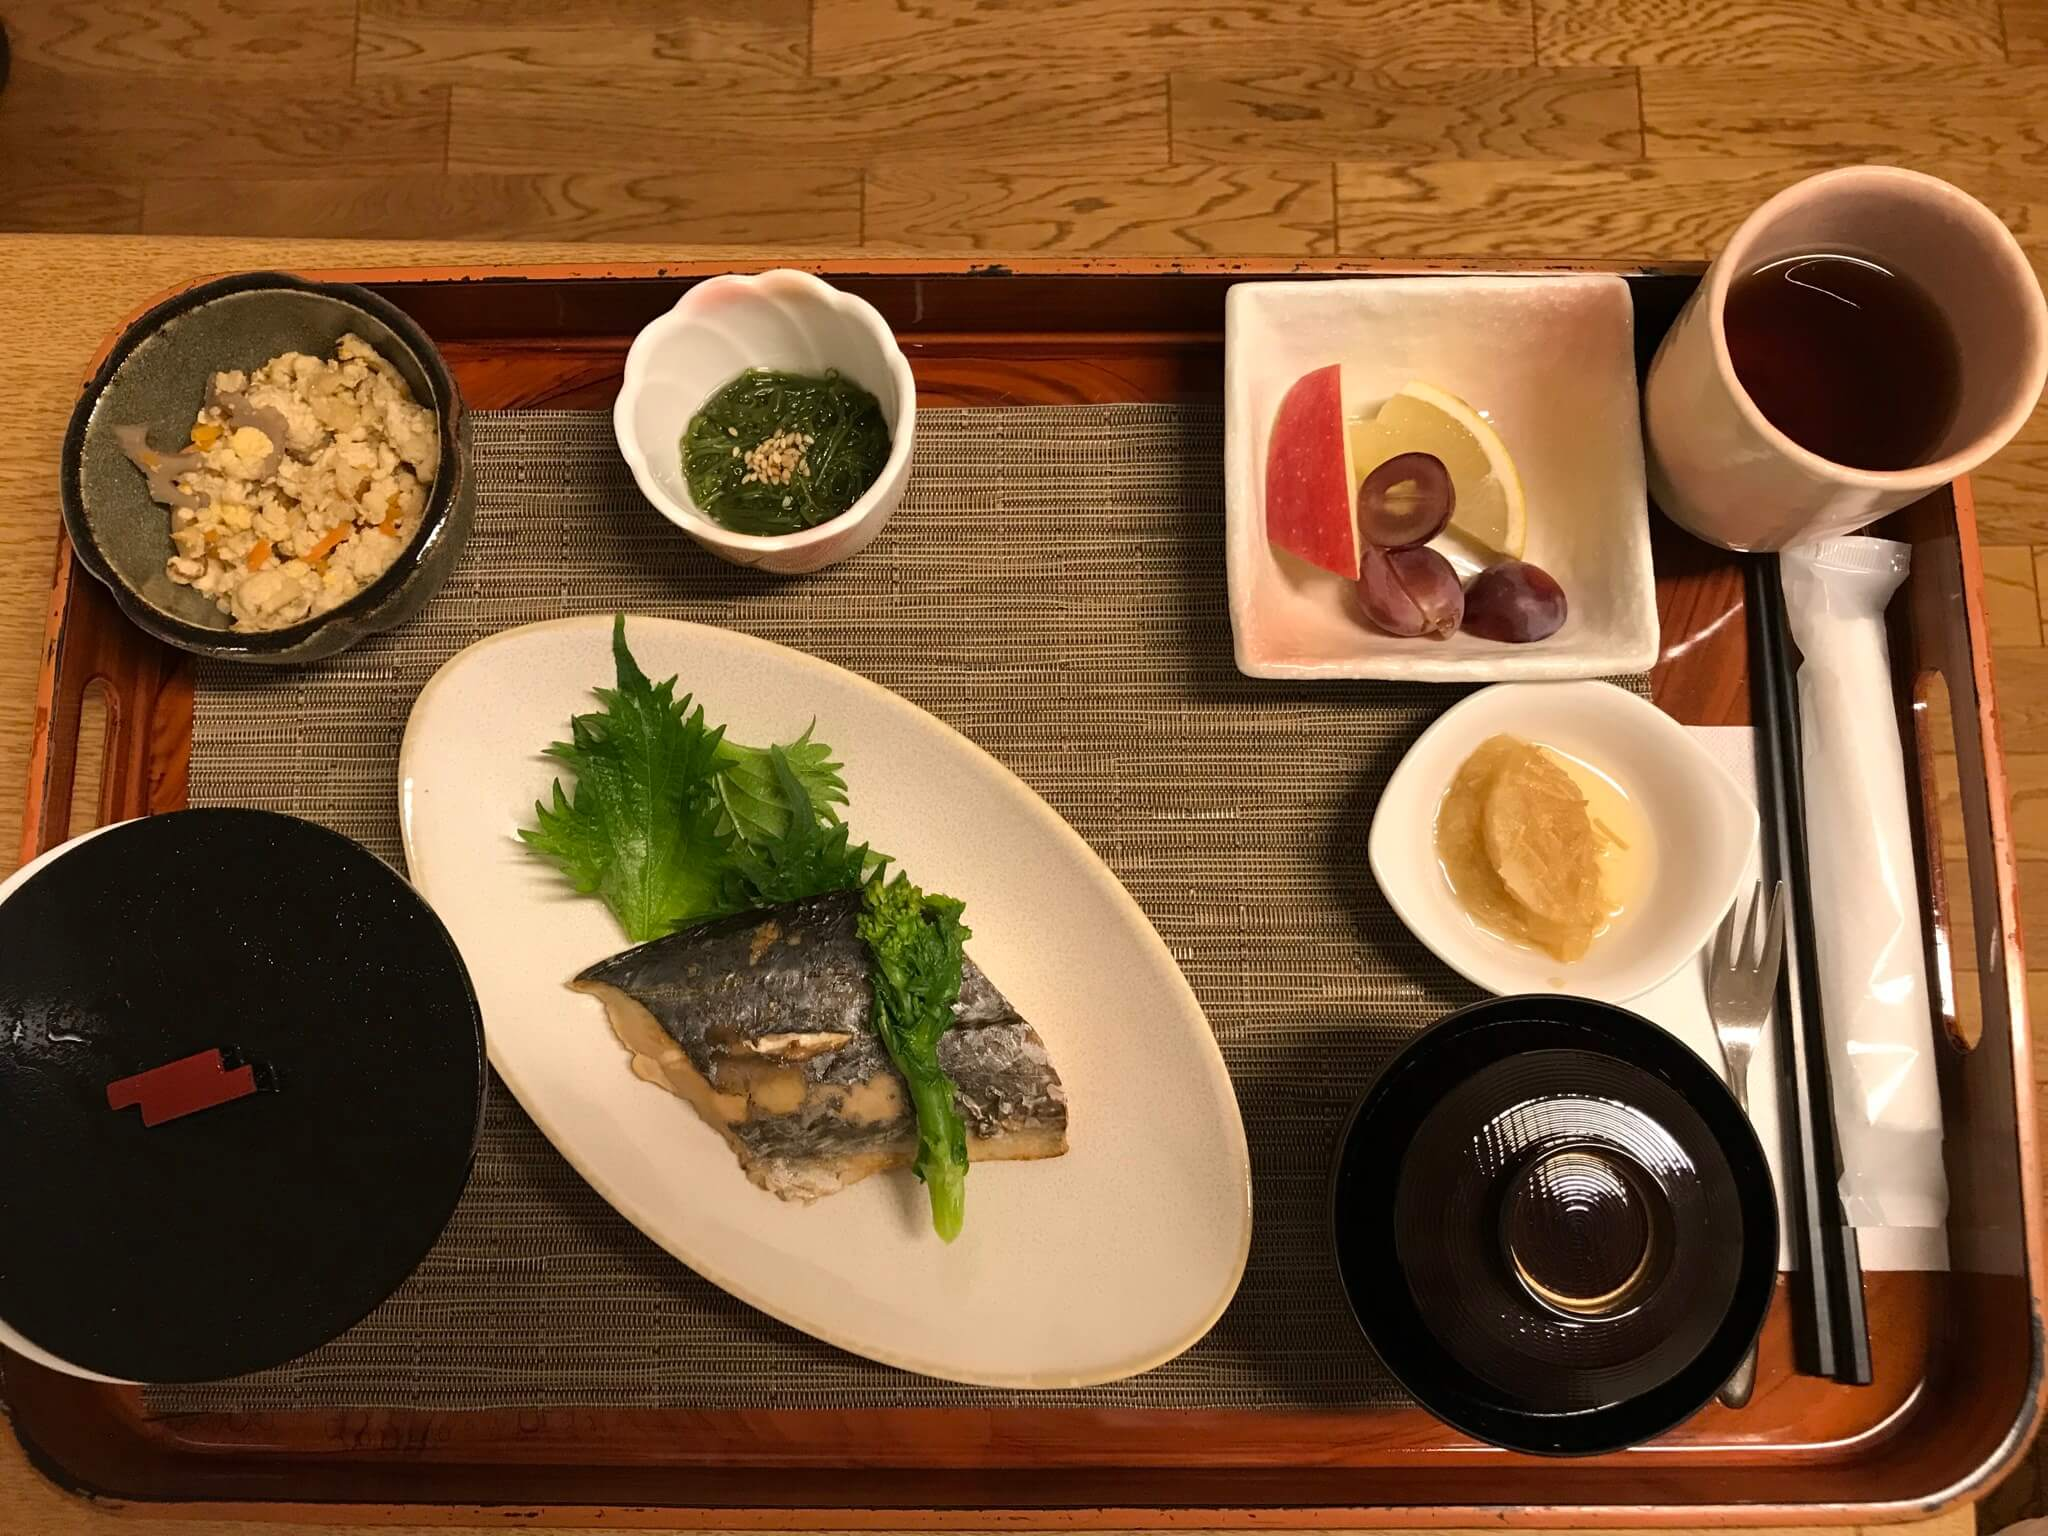 Japanese hospital meals 9 (1)